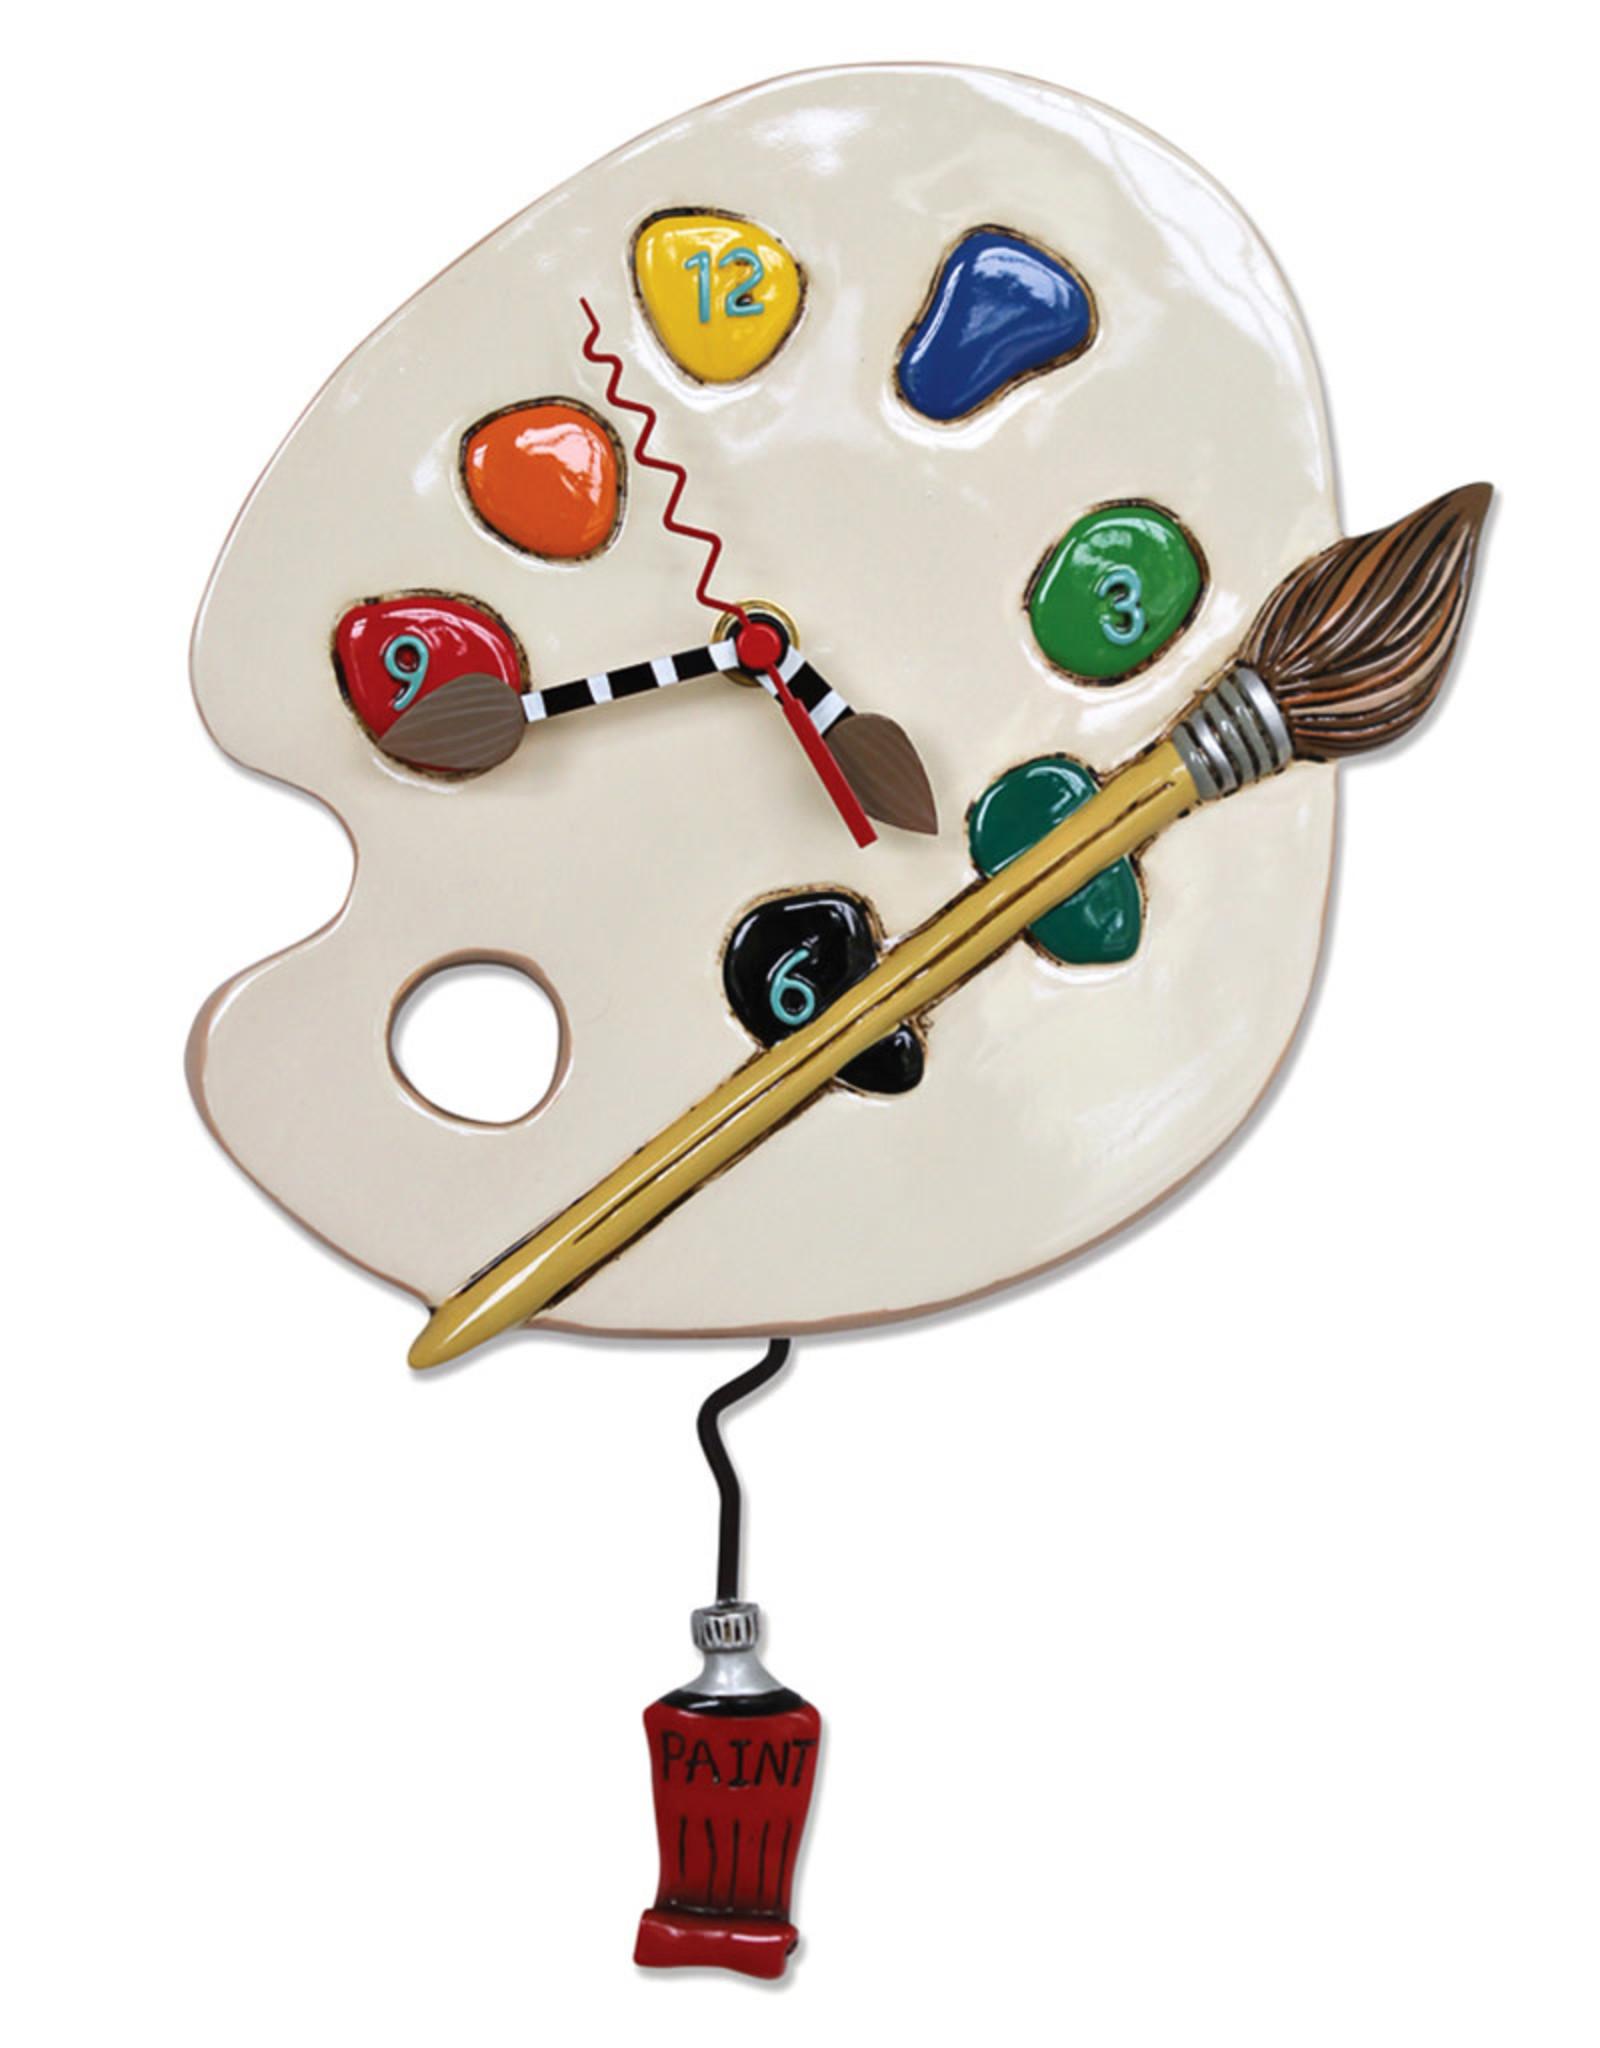 ALLEN DESIGNS ART TIME CLOCK